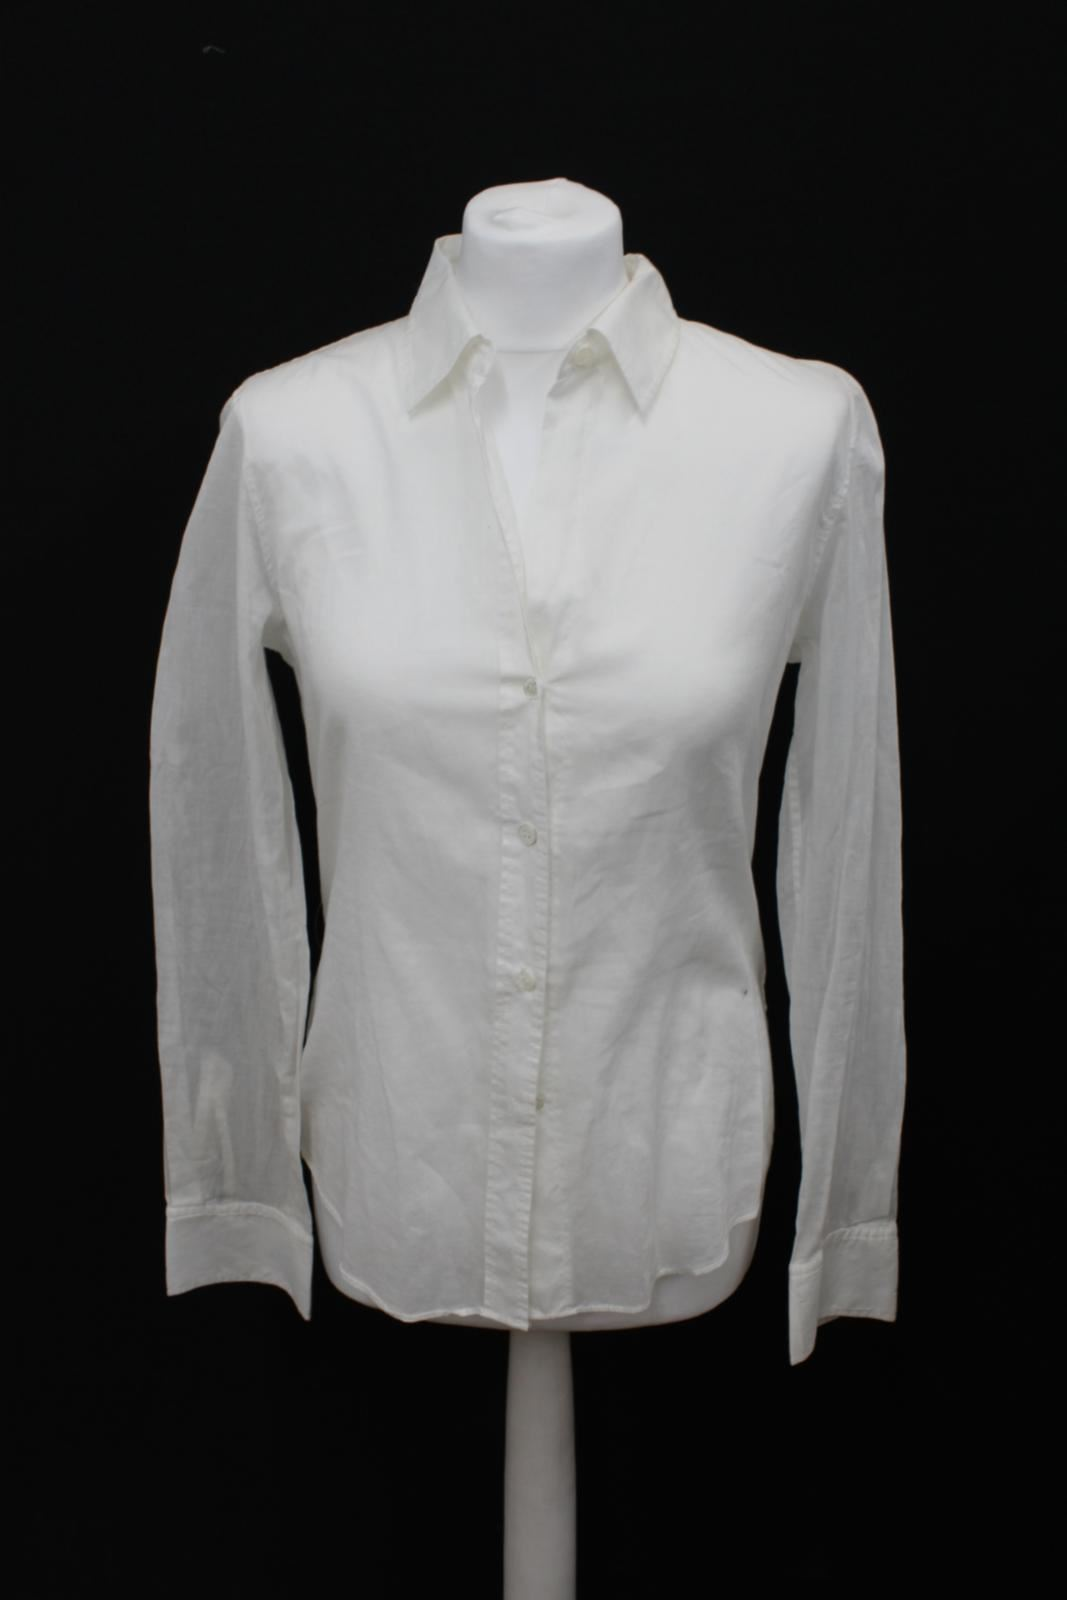 THEORY Ladies Weiß Fold Collarot Button Up Long Sleeve Cotton Shirt Größe M